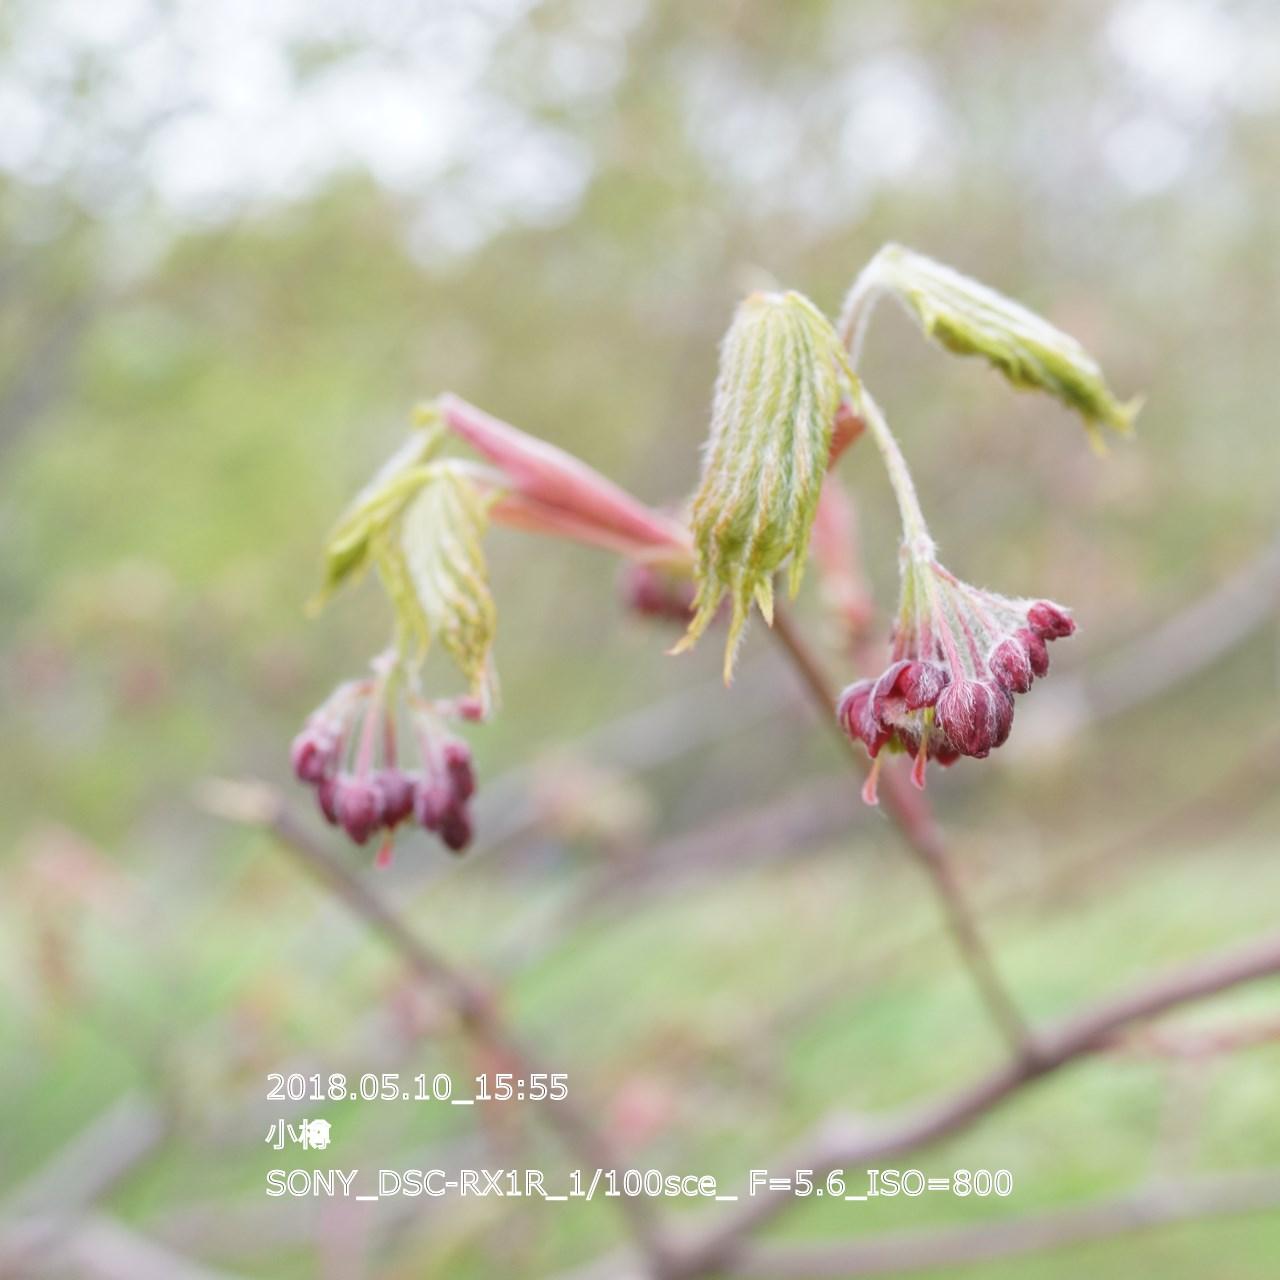 2018/05/11_06:28:35  DSC05264.jpg